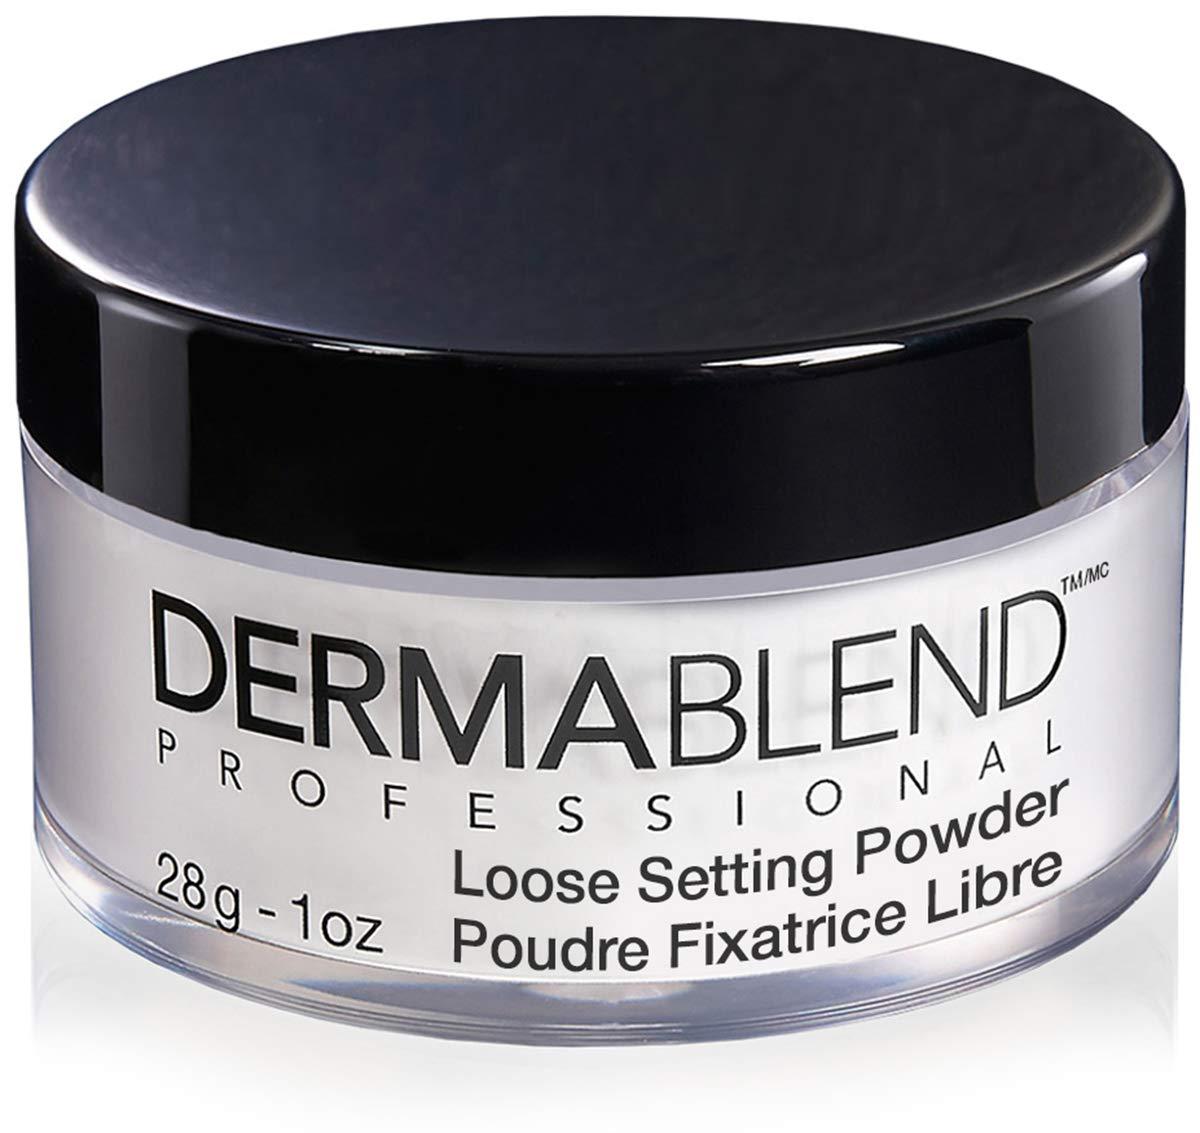 Dermablend Loose Setting Powder, Original, 1 Oz. by Dermablend (Image #1)